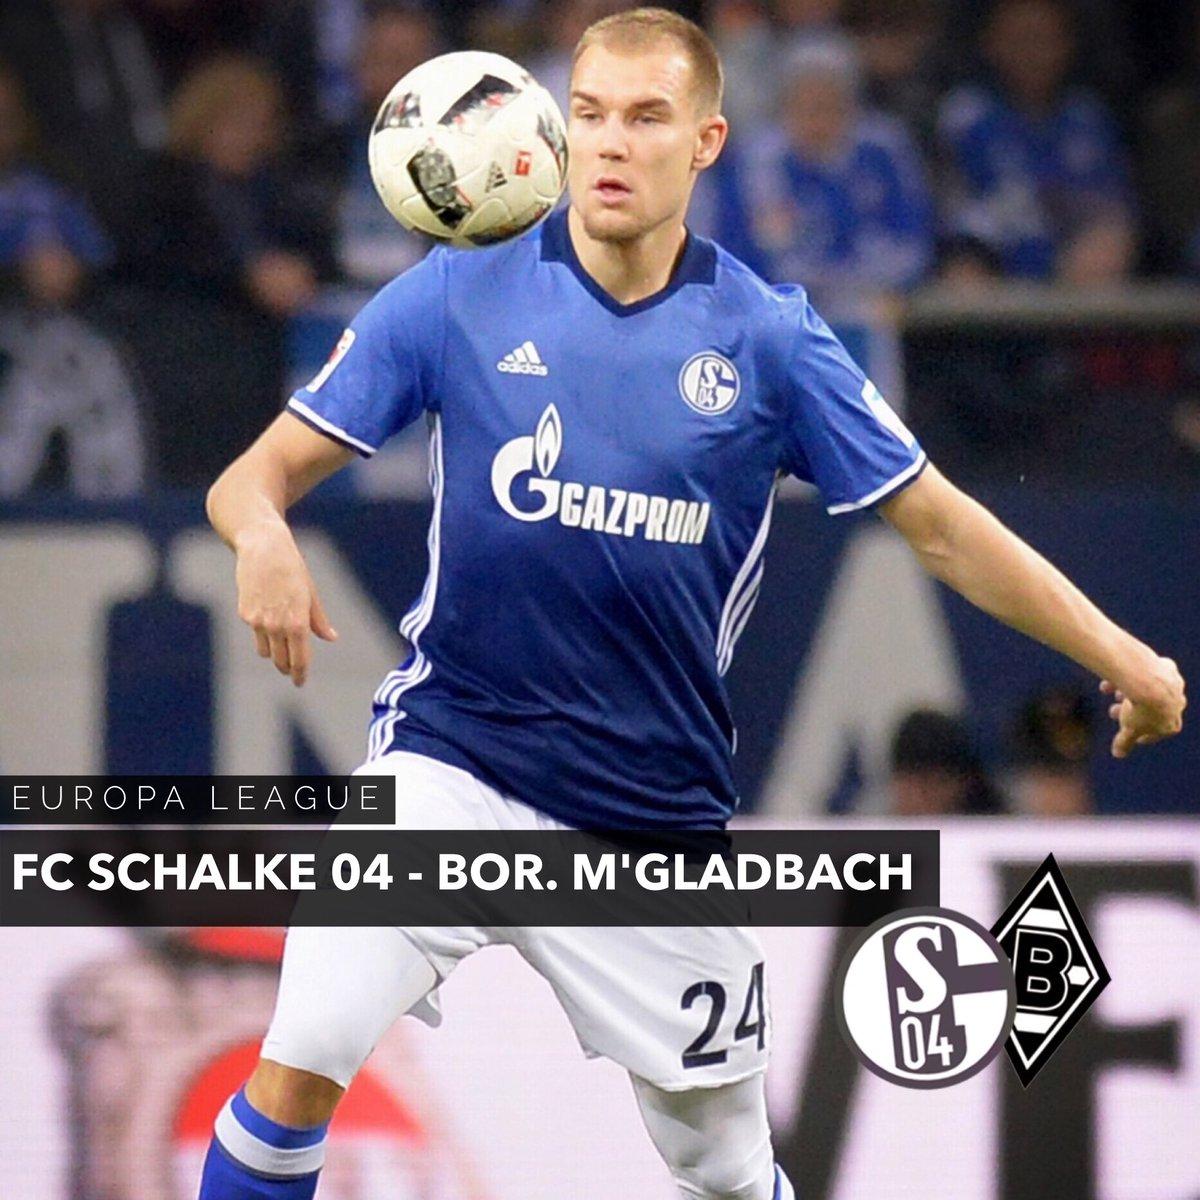 Matchday! 👊 #S04BMG #UEL https://t.co/0T15EkmIdN